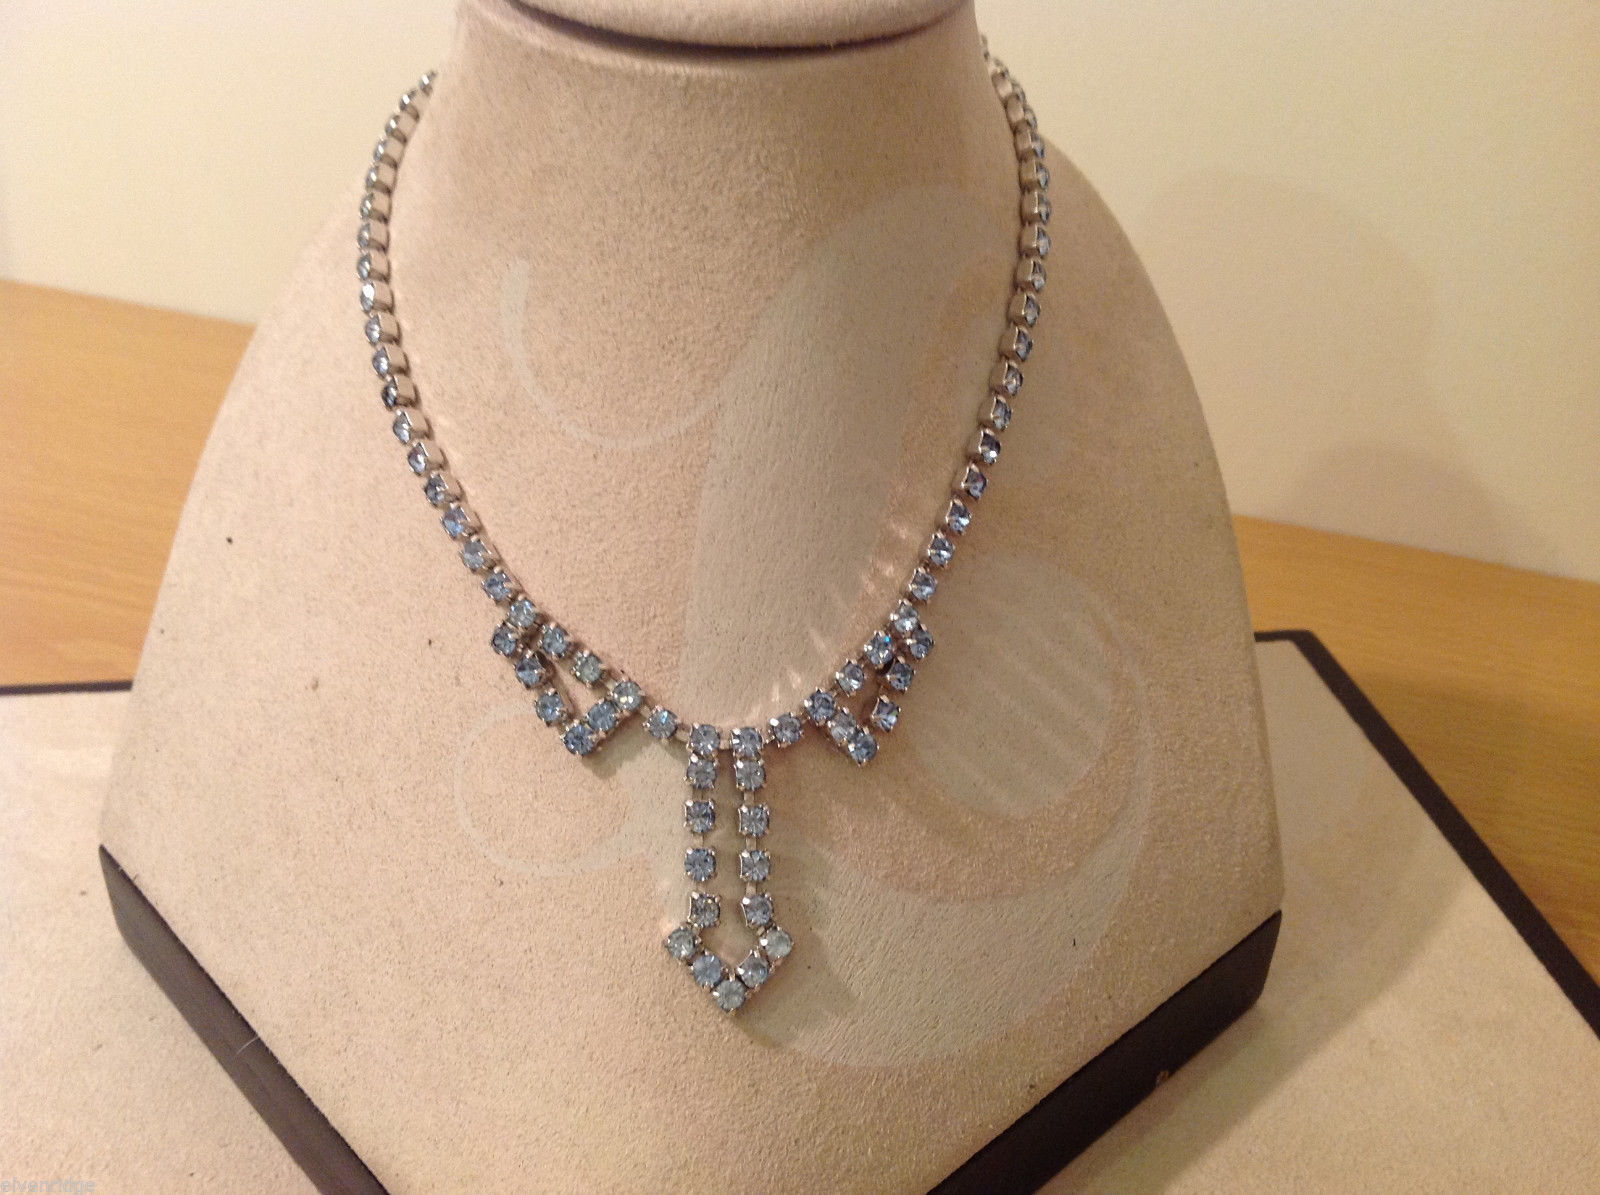 Vintage Silver Tone Metal Light Blue Rhinestones Necklace Adjustable length